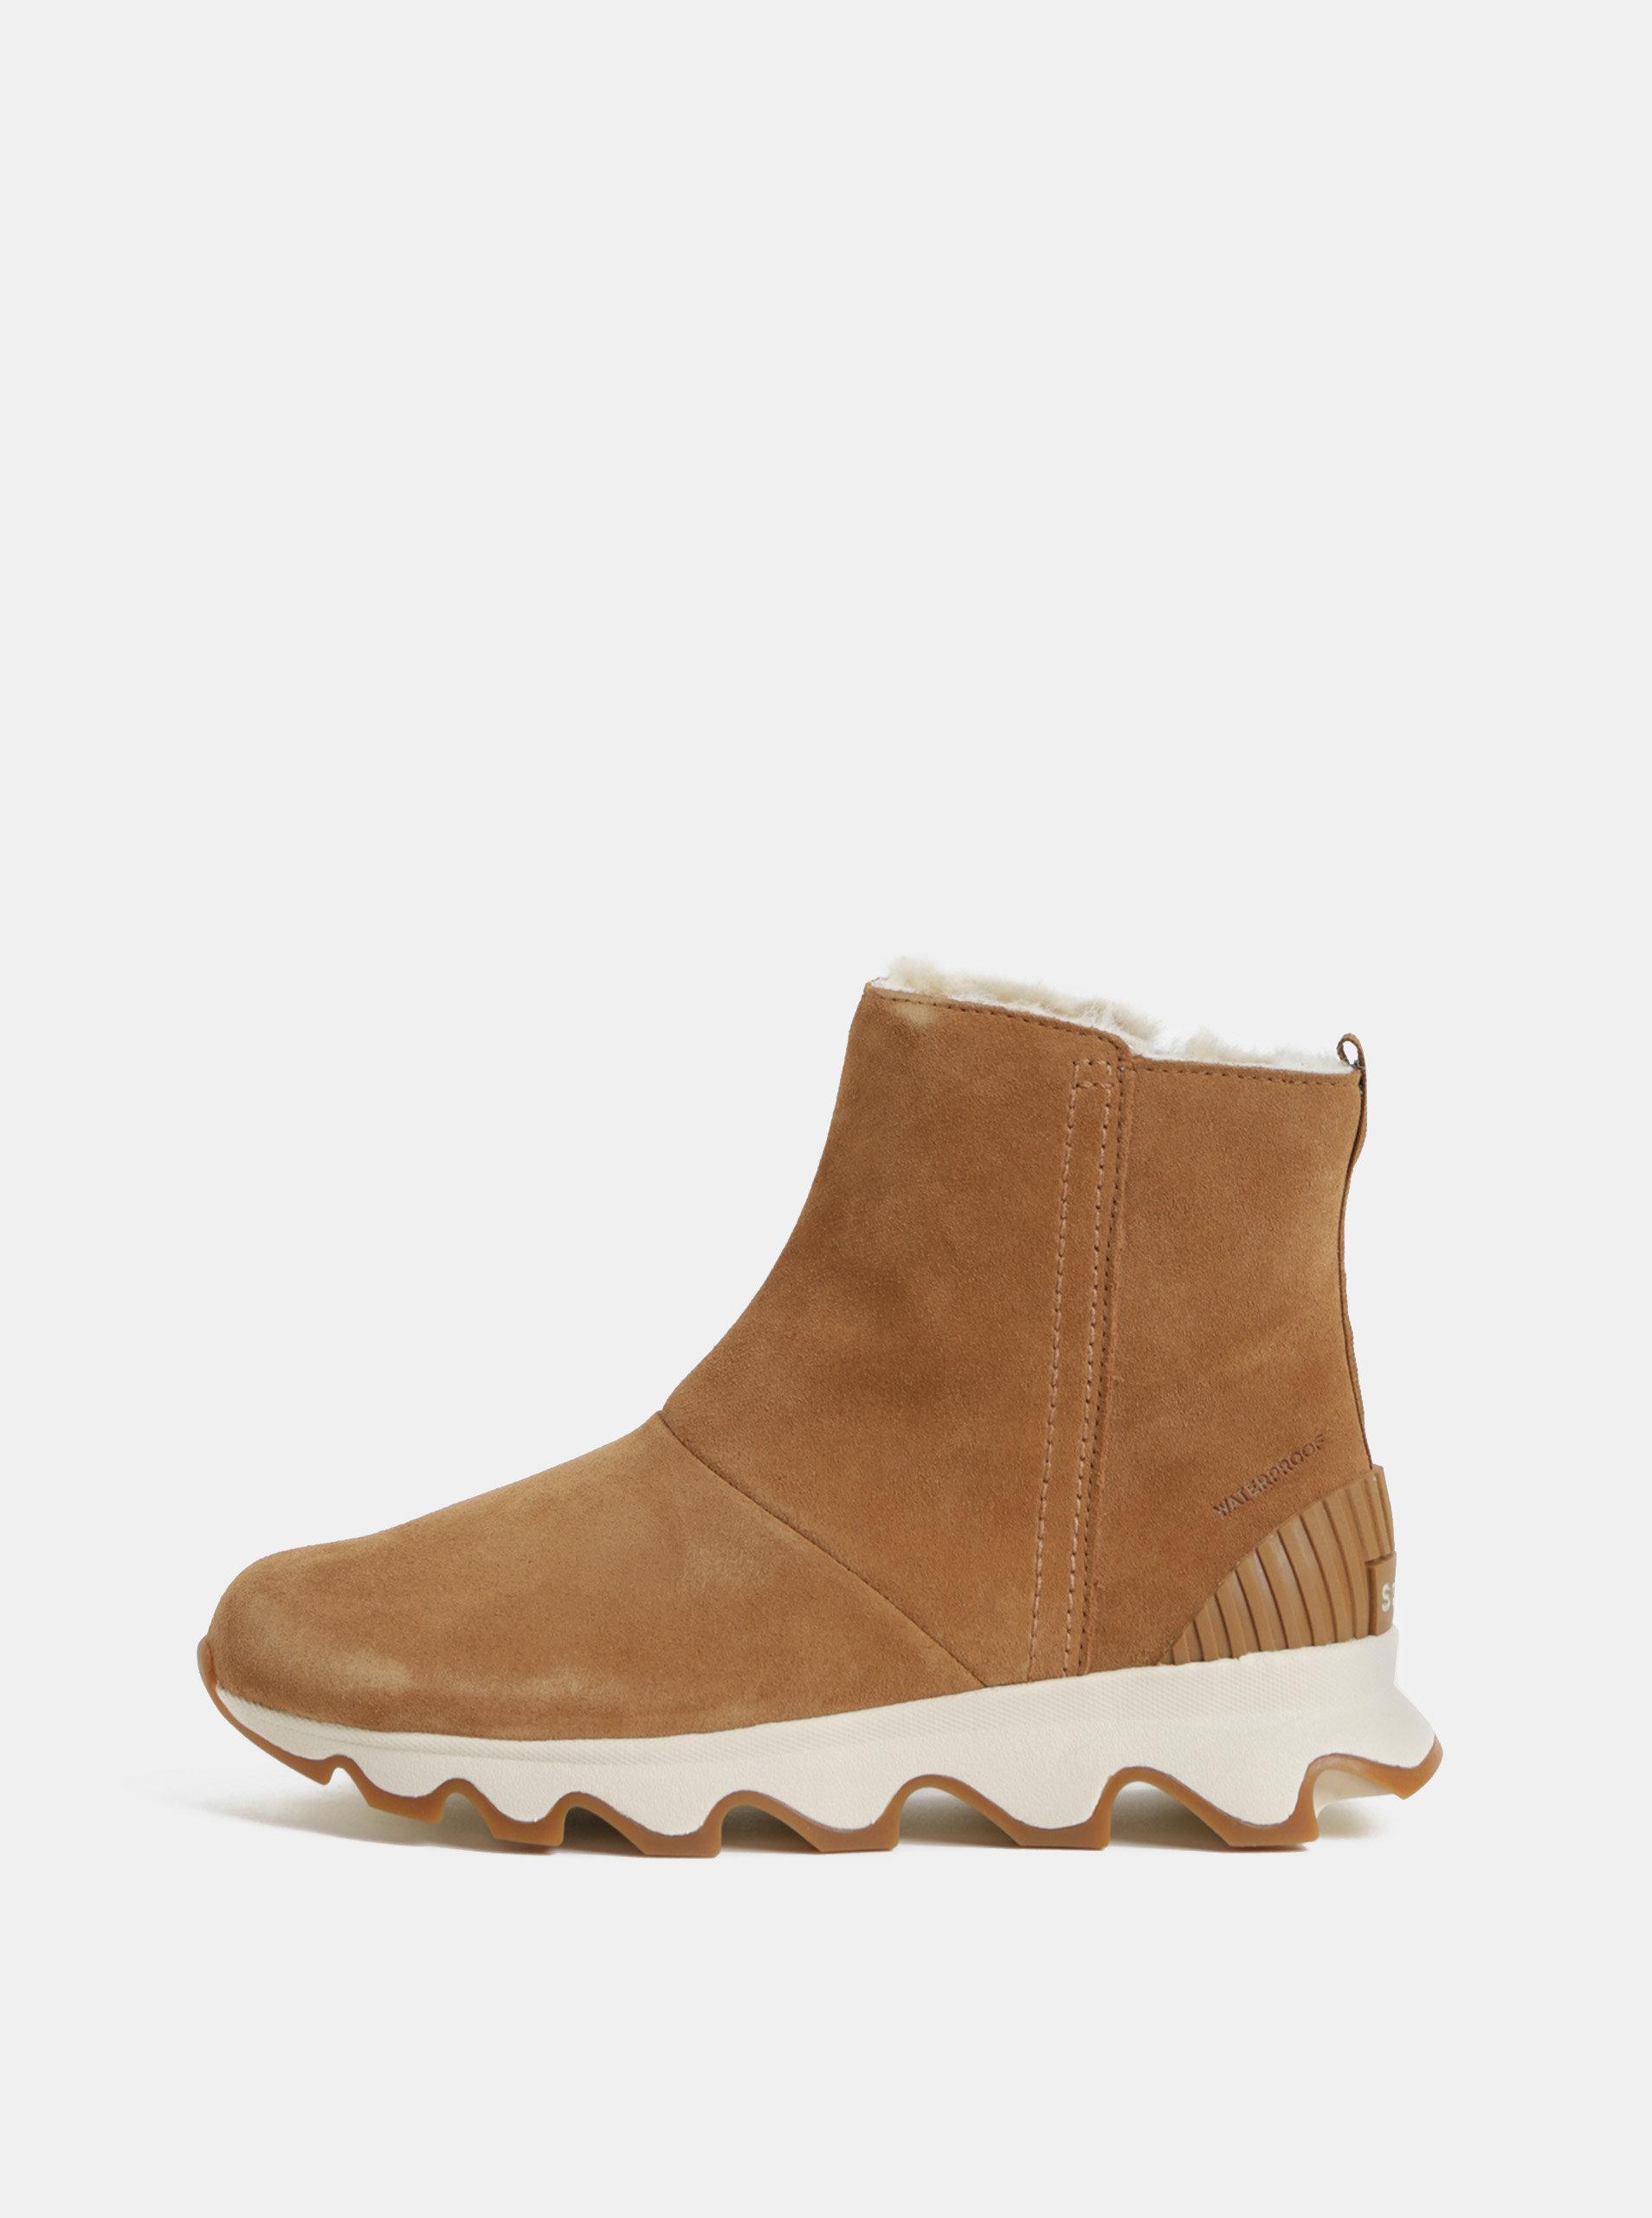 Hnedé dámske zimné členkové nepremokavé topánky v semišovej úprave SOREL  Kinetic ... fc1e48d2a62